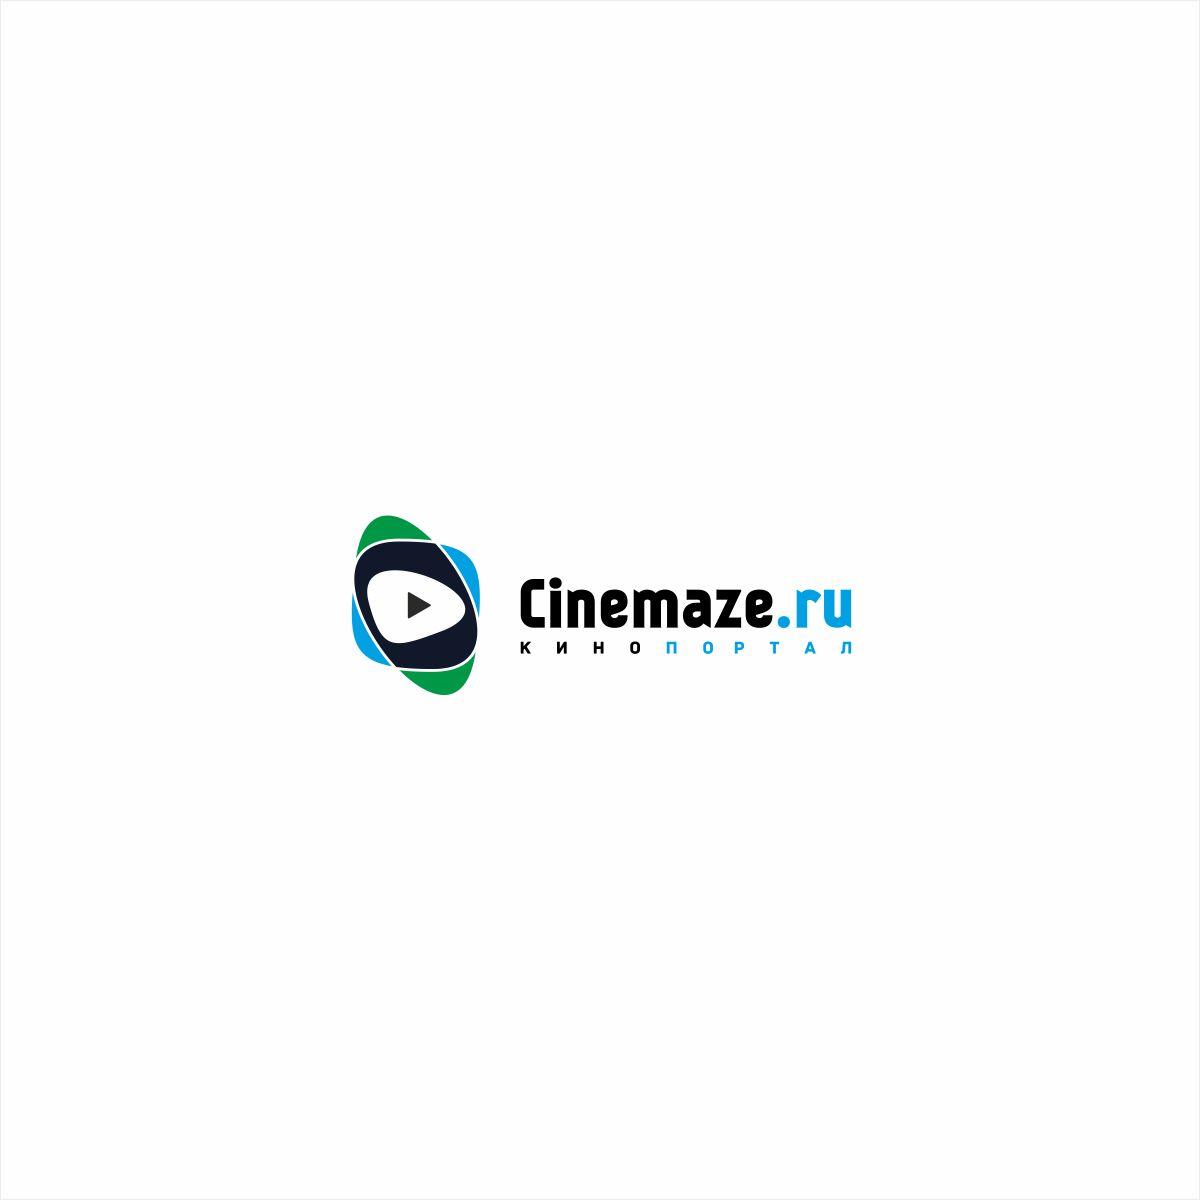 Логотип для кино-сайта - дизайнер smithy-style